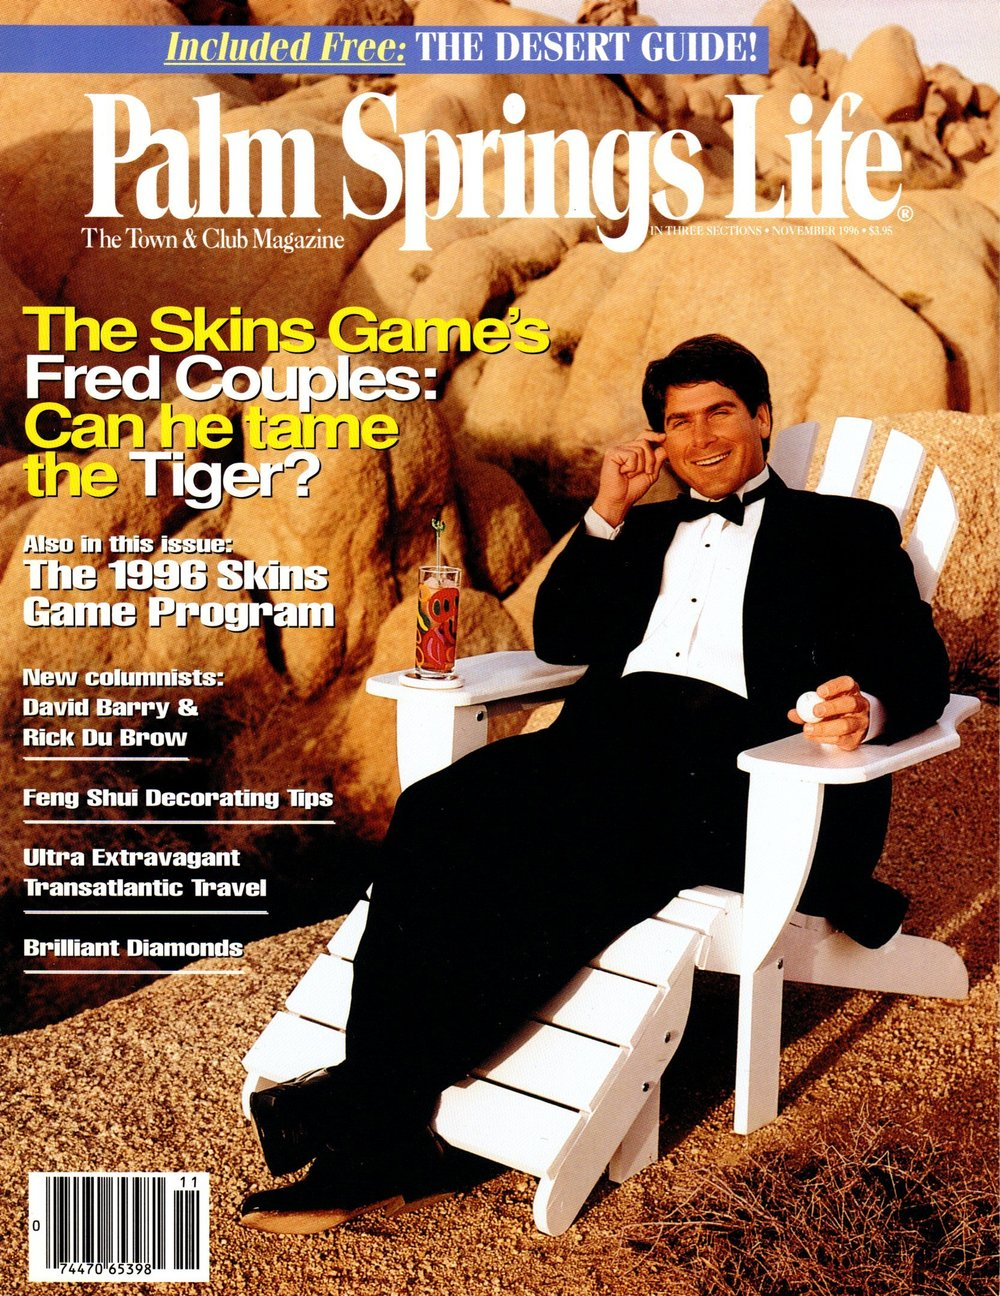 Palm Springs Life, November 1996